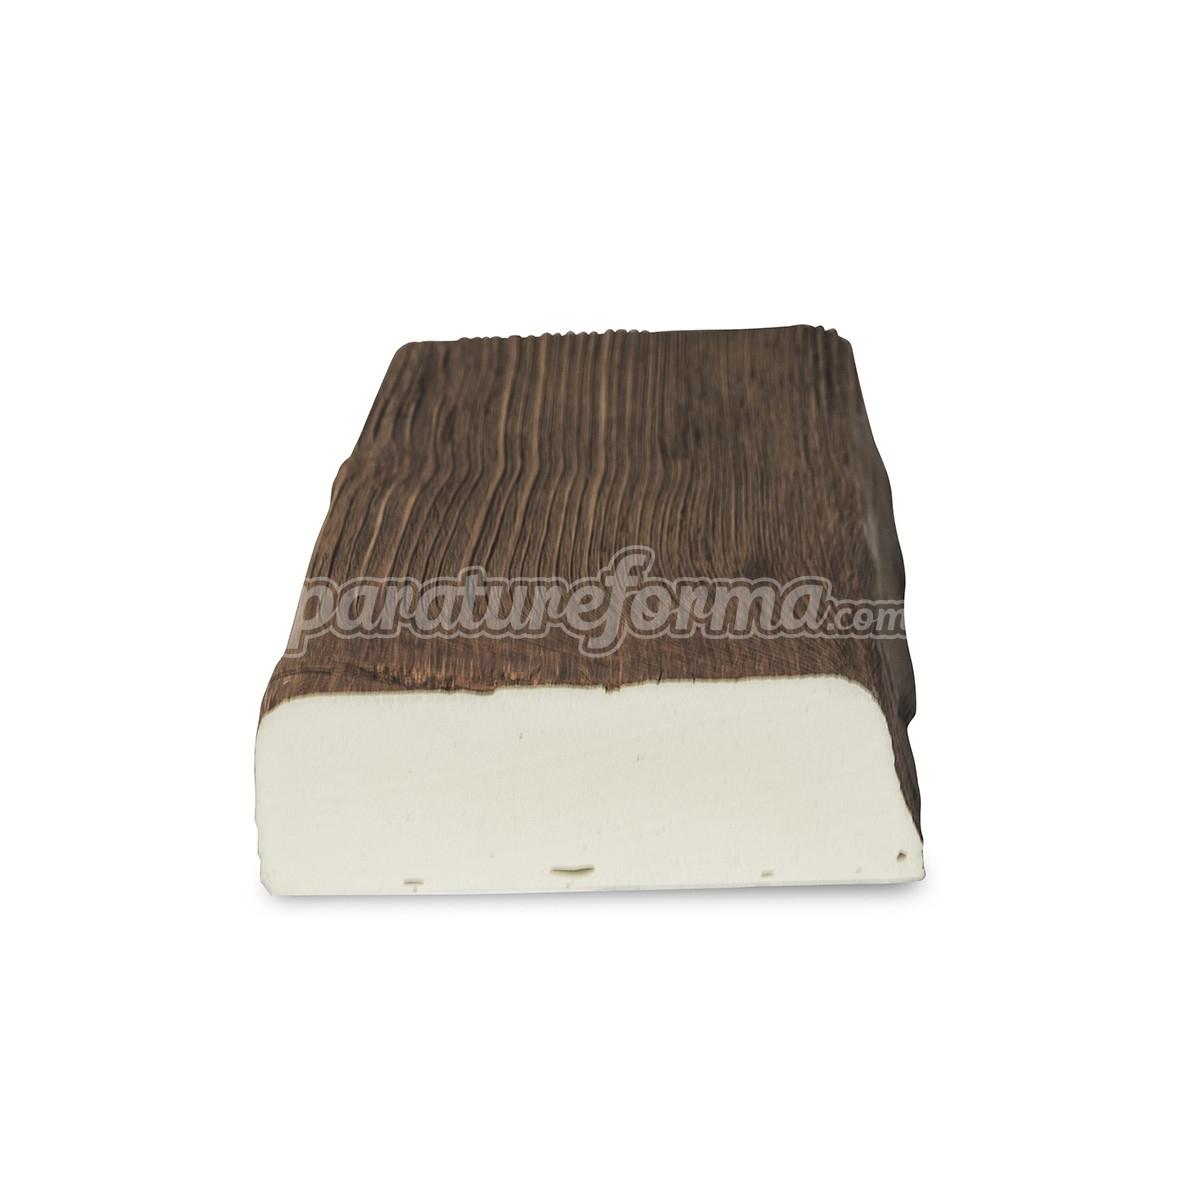 Viga maciza 300x12,5x4 imitación madera Grupo Unamacor